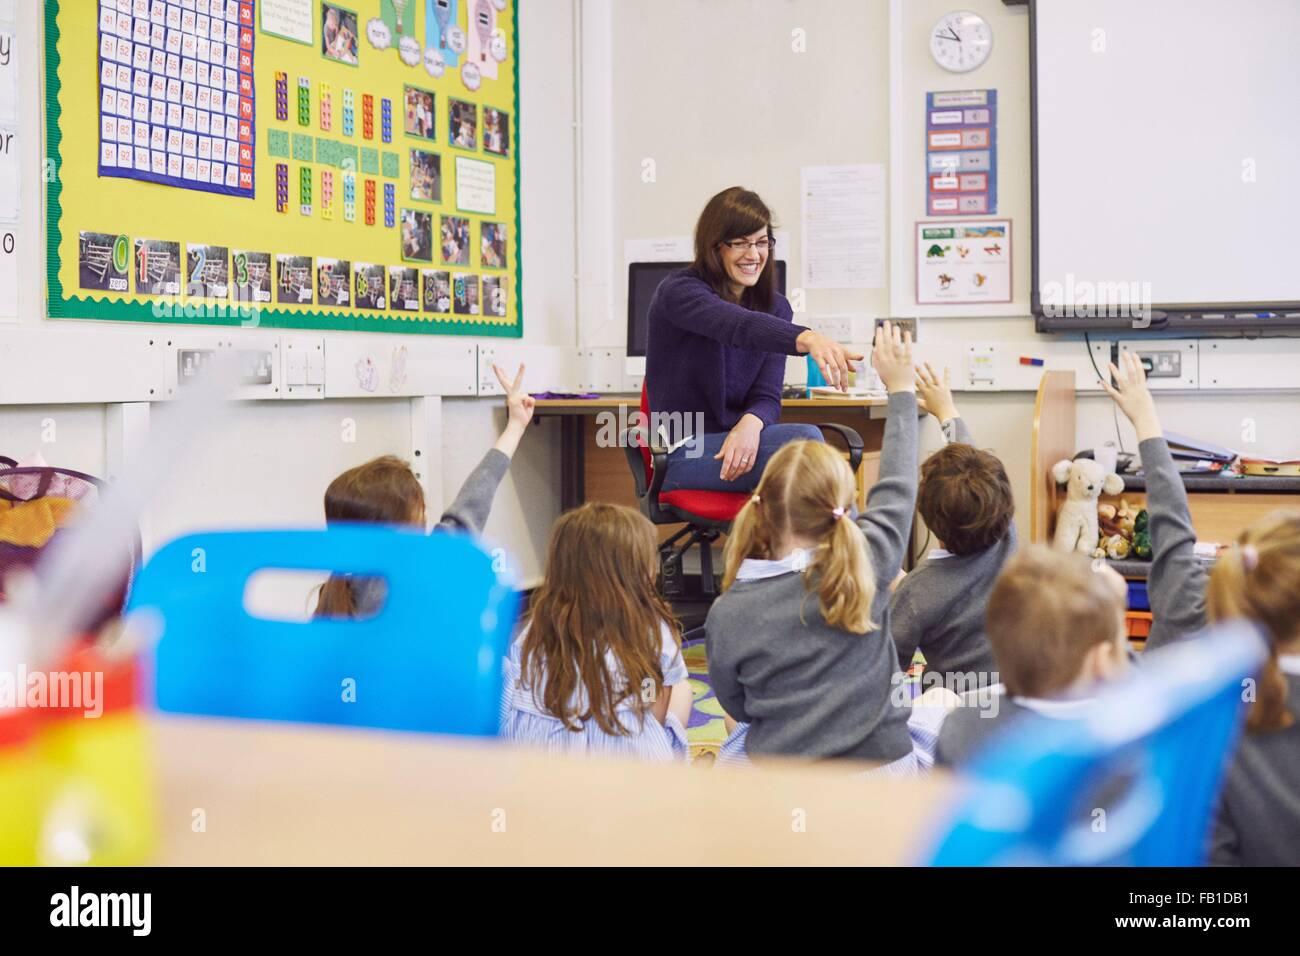 Teacher questioning children sitting on floor in elementary school classroom - Stock Image